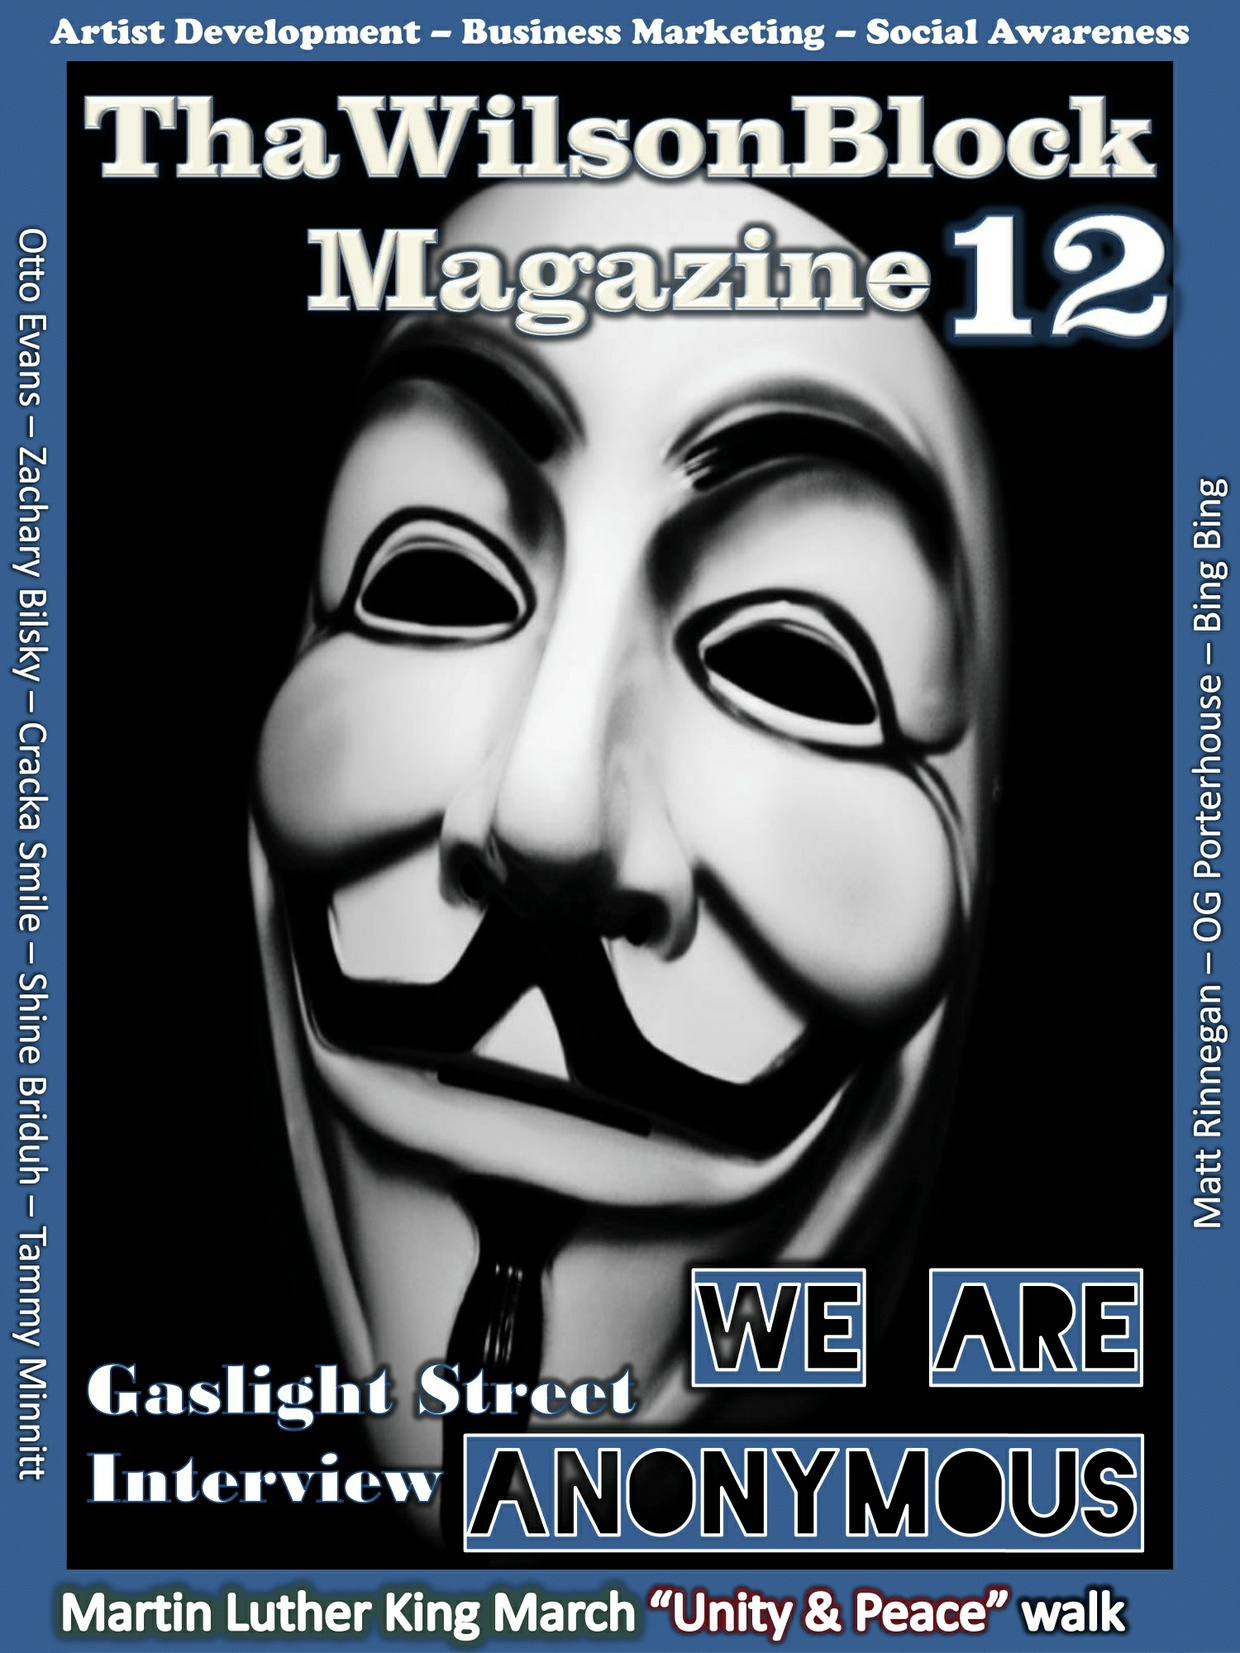 ThaWilsonBlock Magazine Issue12